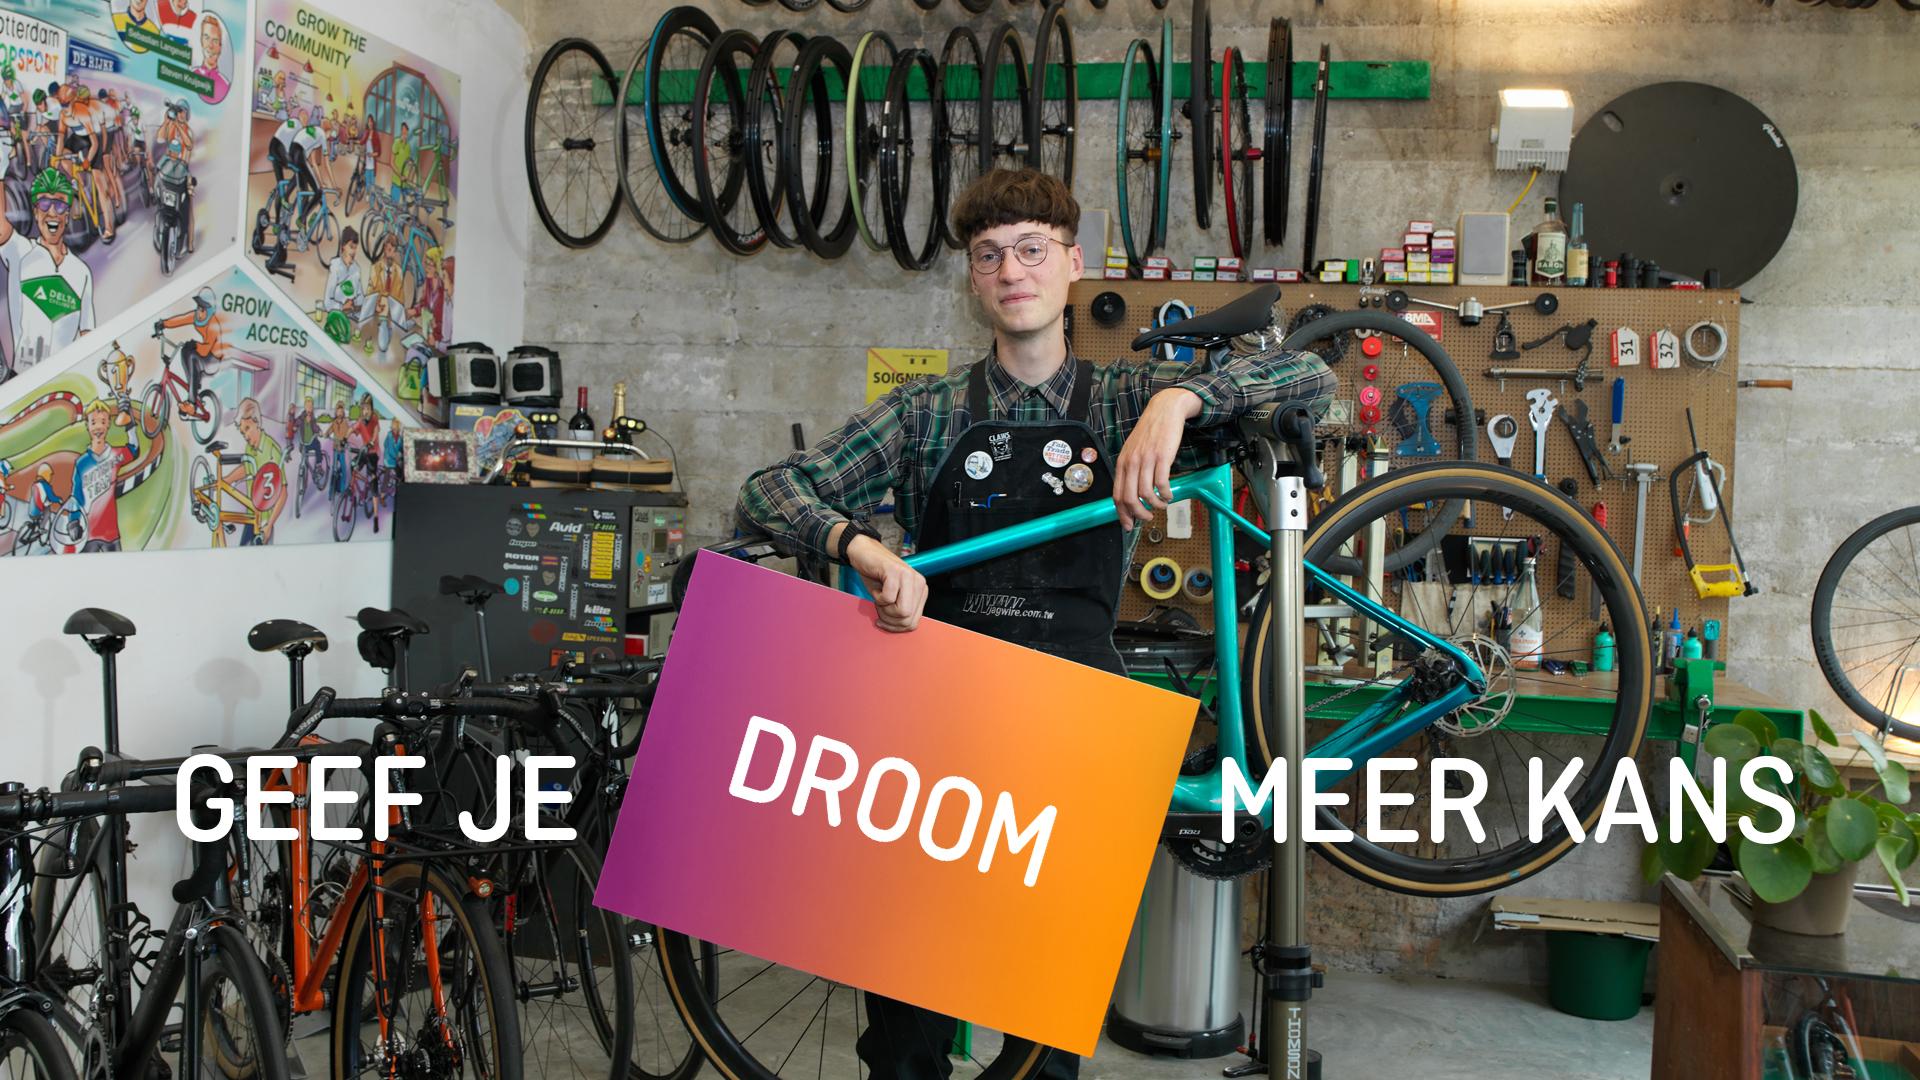 Zaterdag 22 juni, startersdag KvK in Eindhoven. Kom ook!